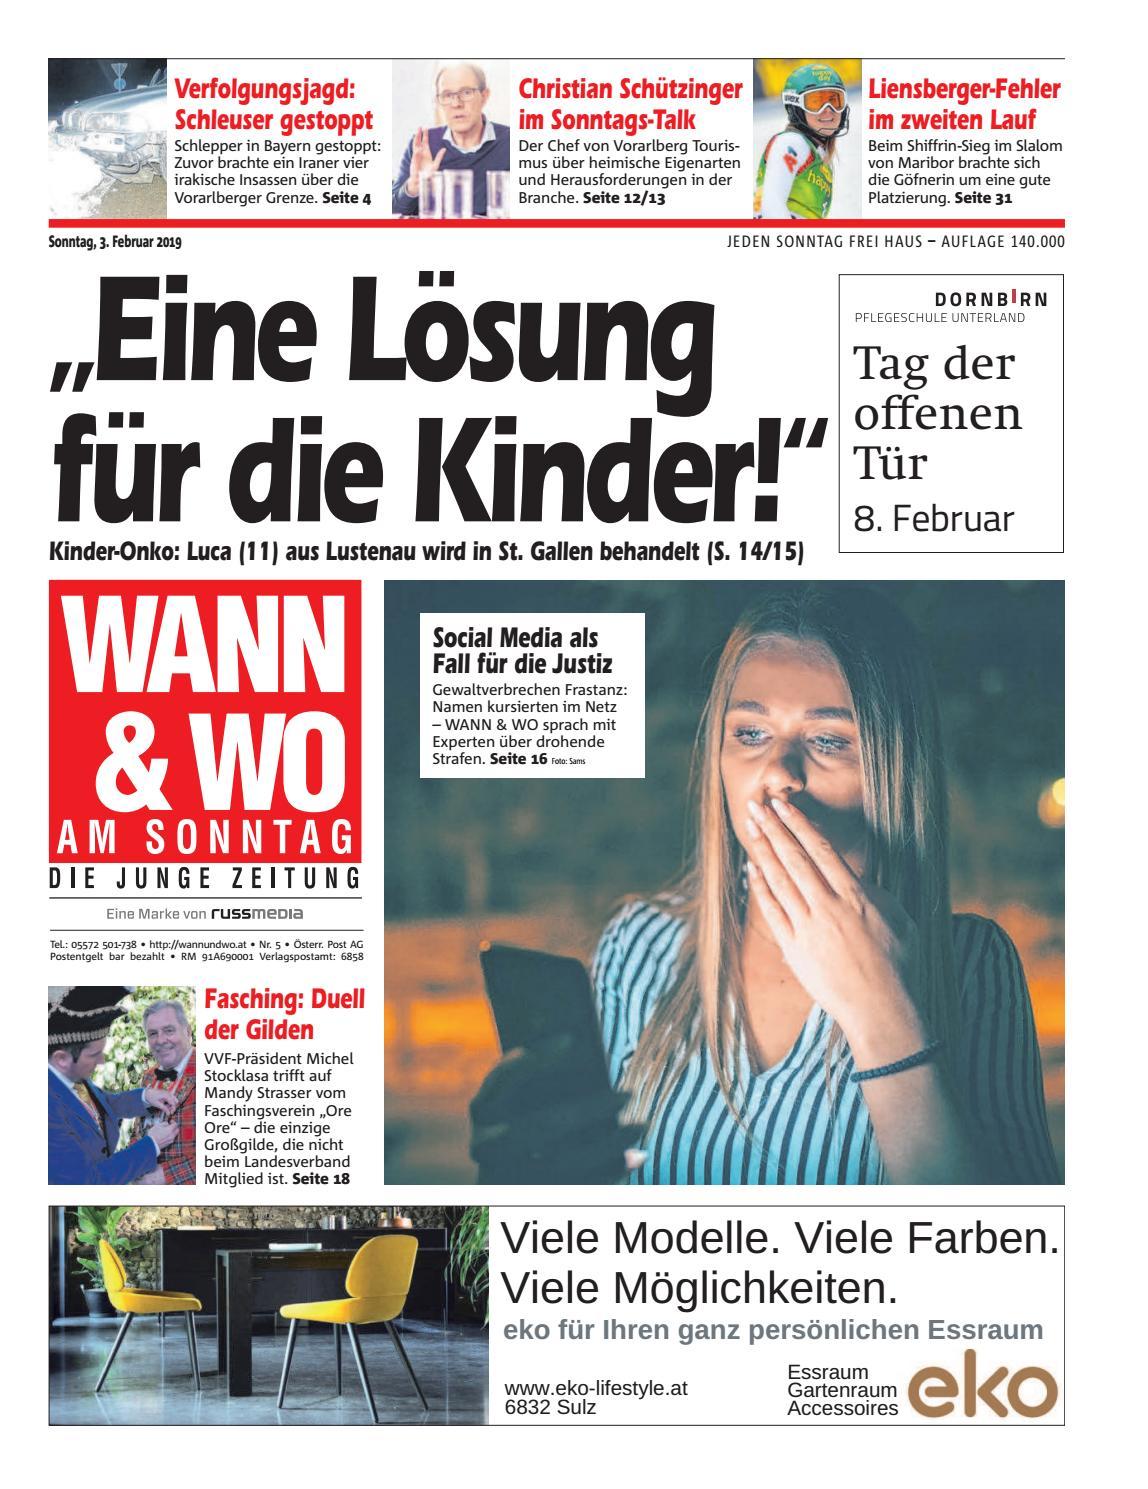 Dating Brnbach - flirte im Chat von ilahi-tr.org